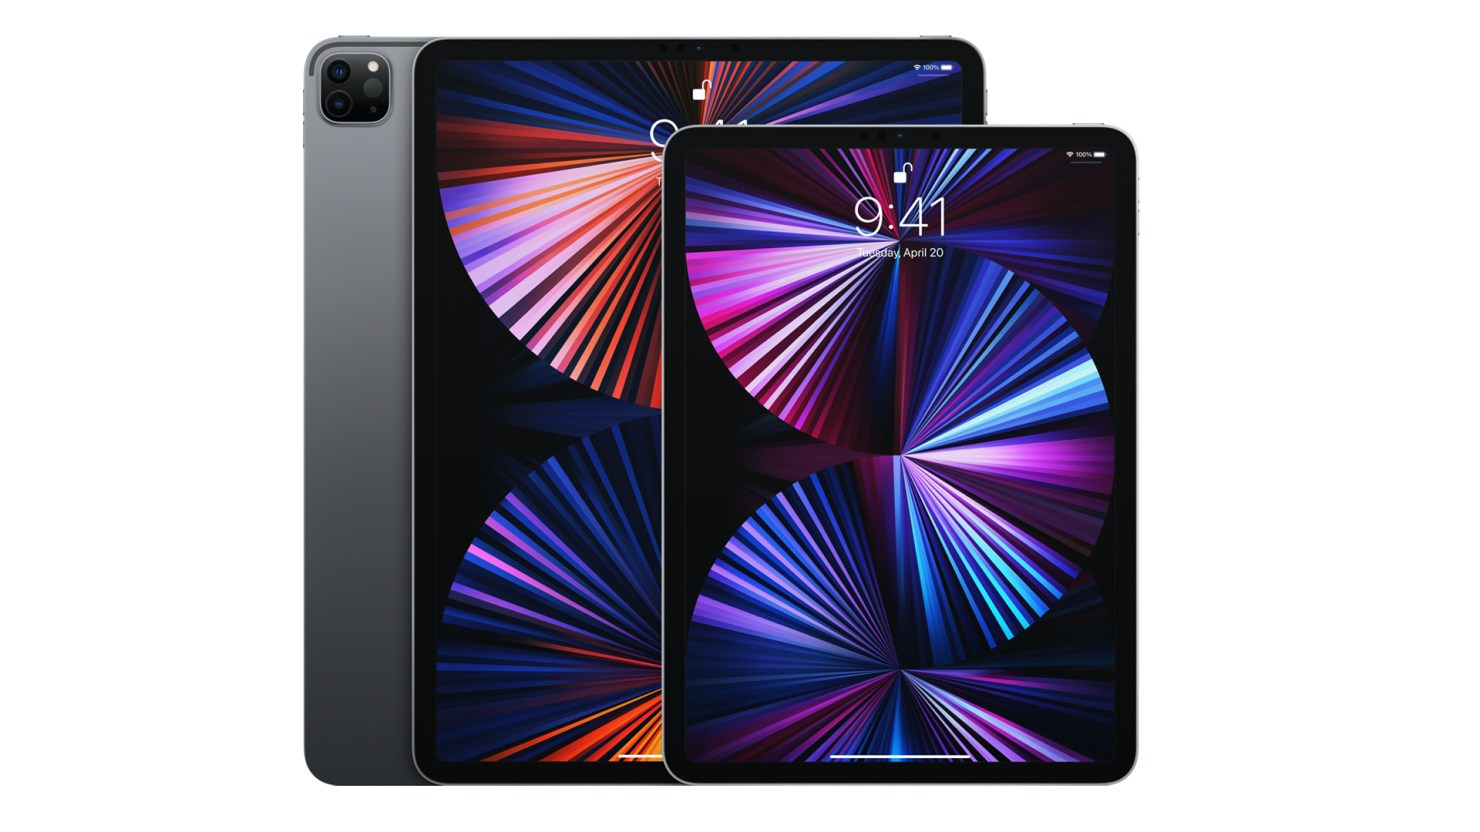 Apple iPad Pro 2021 Specs, Price, Availability & More